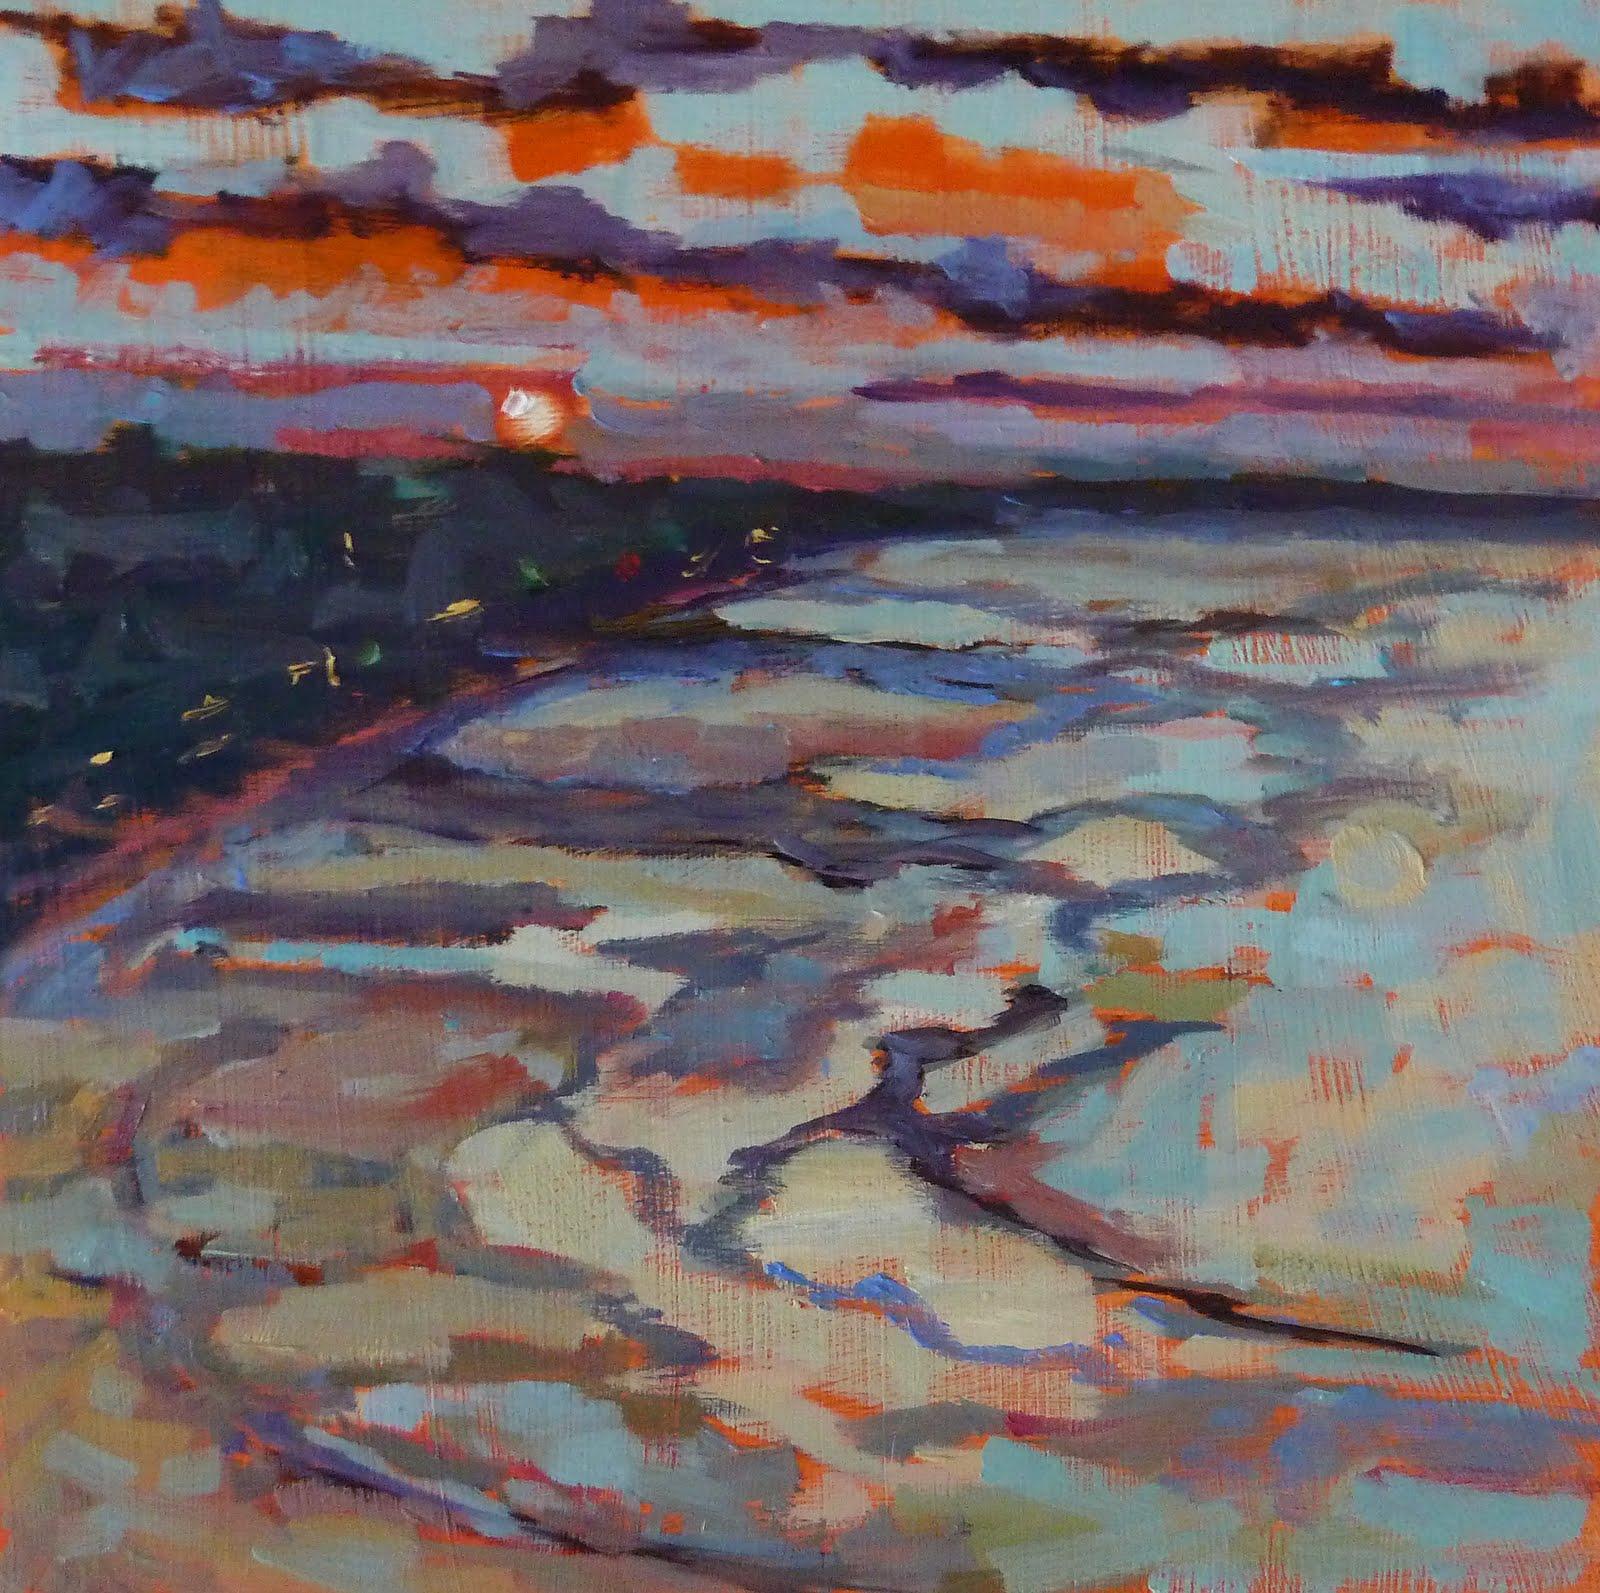 """Nantasket Beach Sunset 8x8 oil on gatorboard Framed, black satin wood Unframed Price is $175"" original fine art by Mary Sheehan Winn"